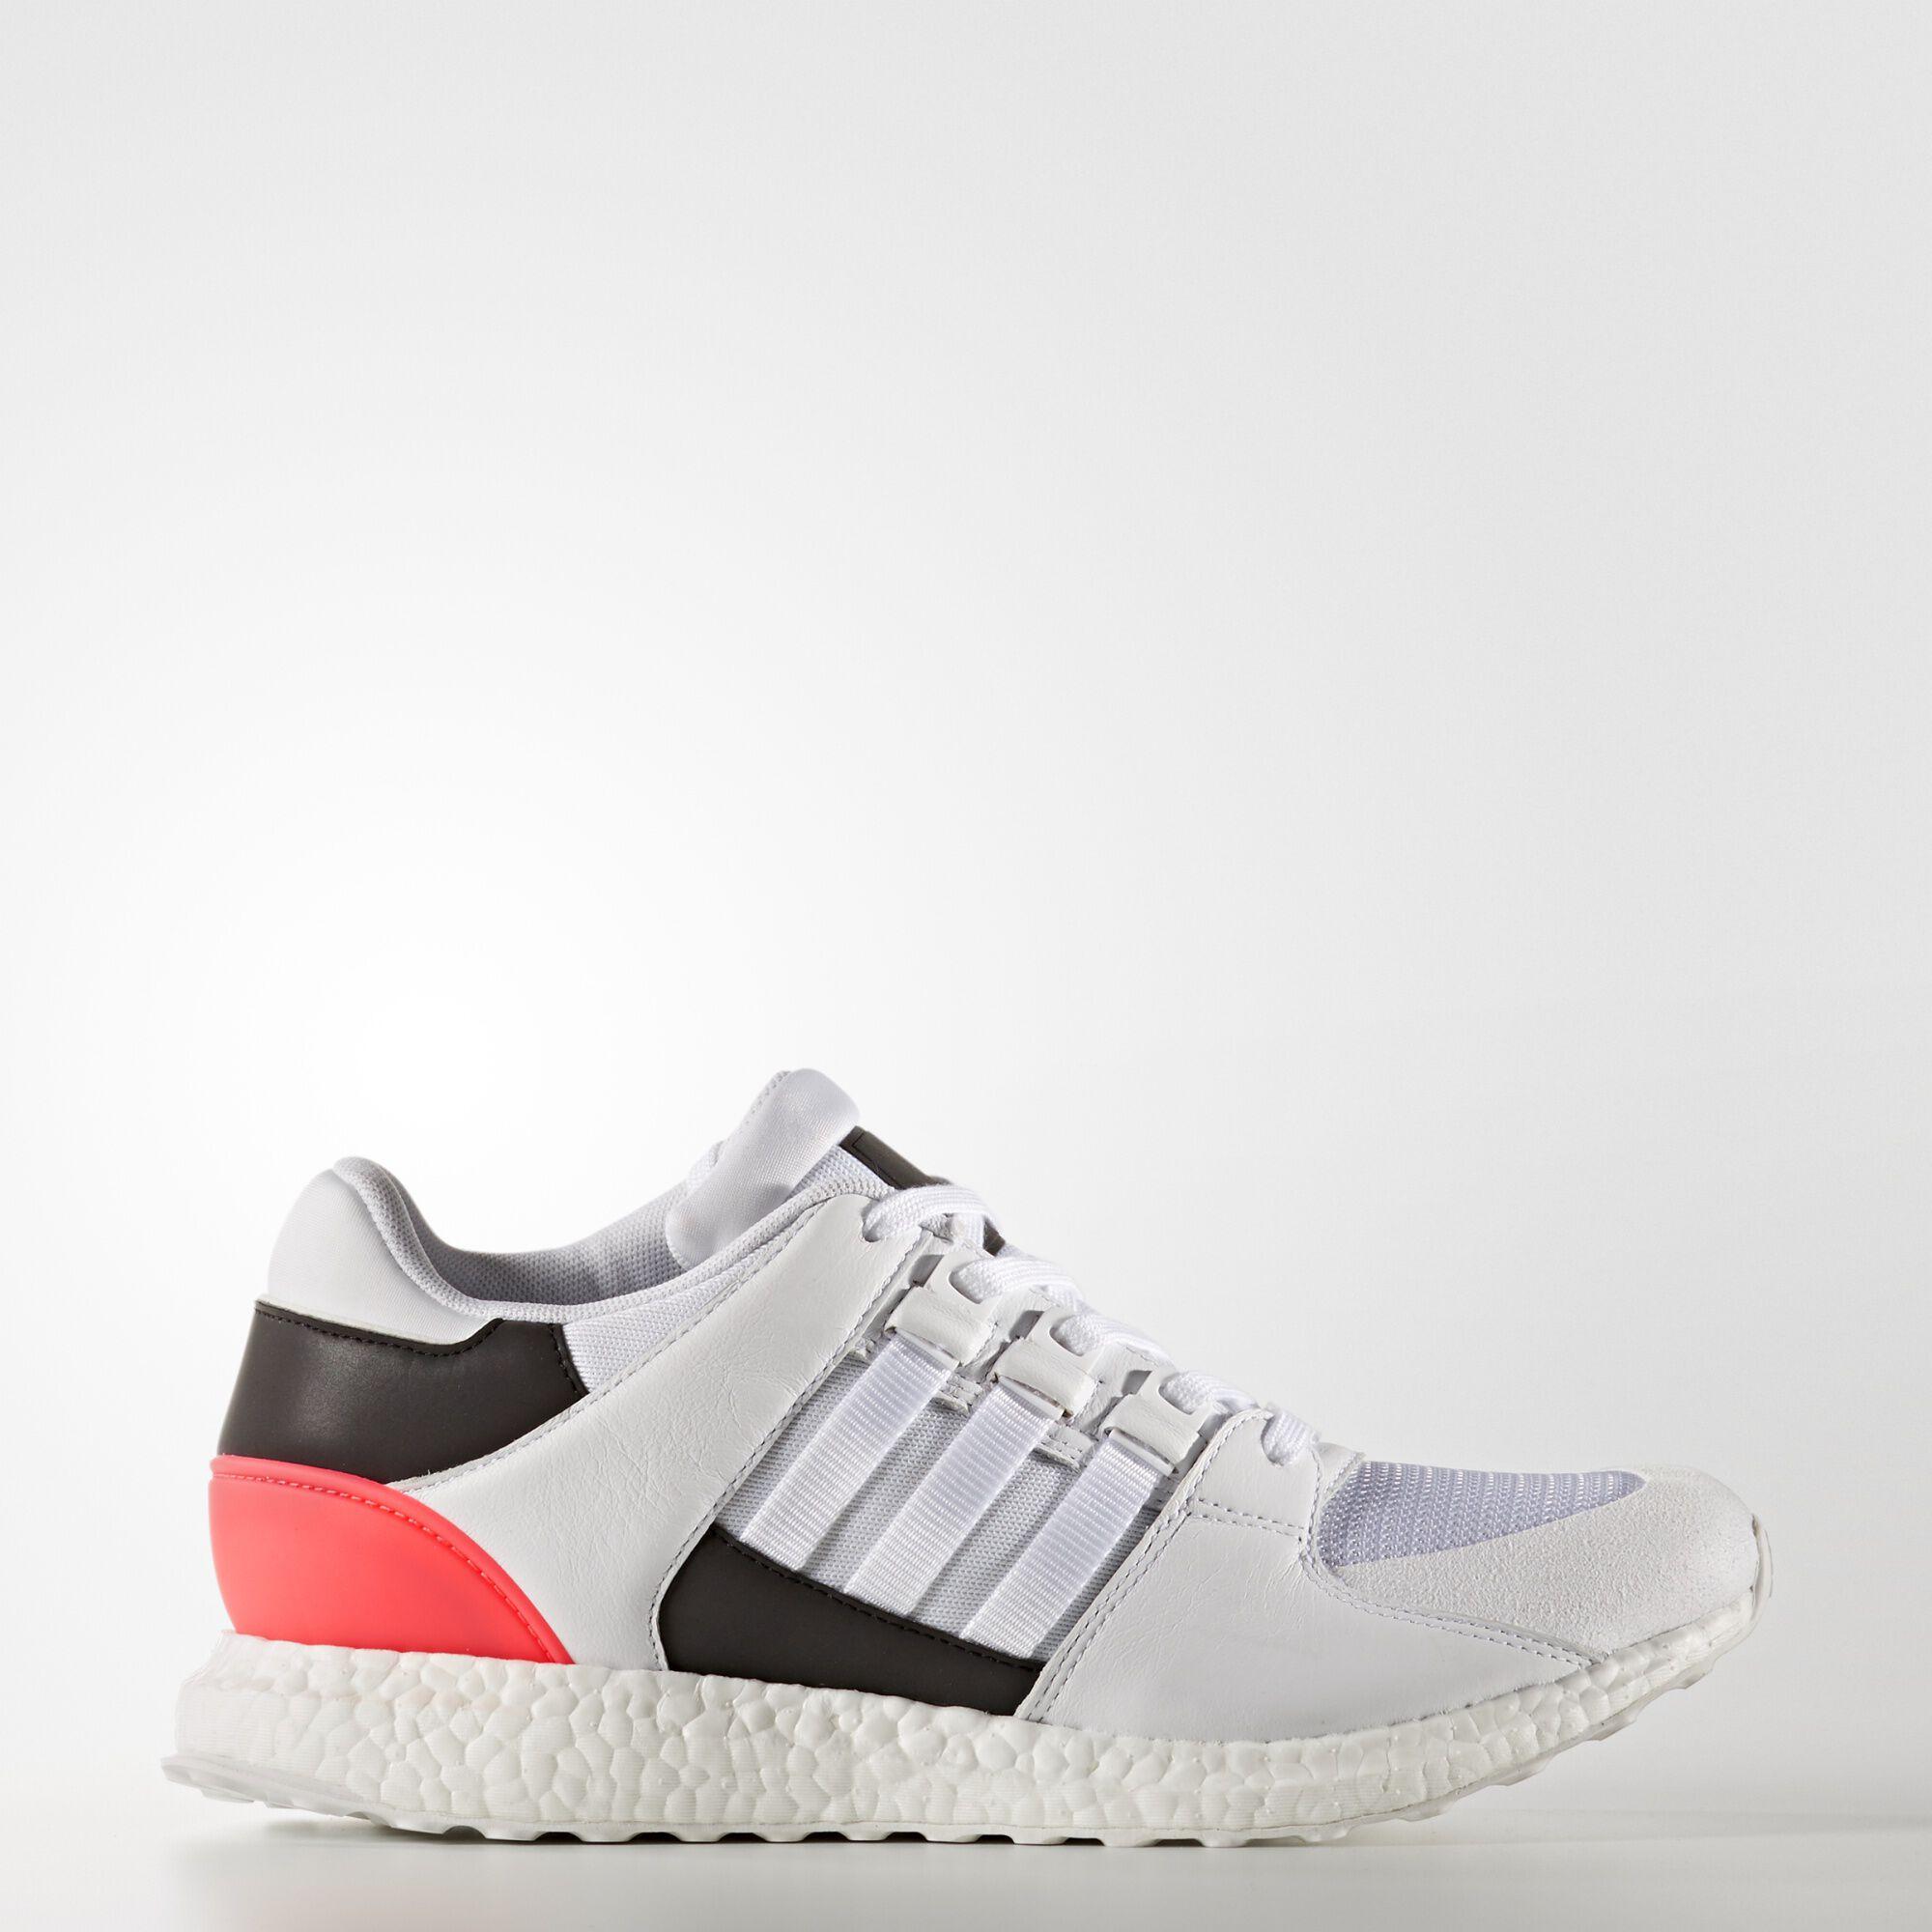 Adidas Neo D Chill M